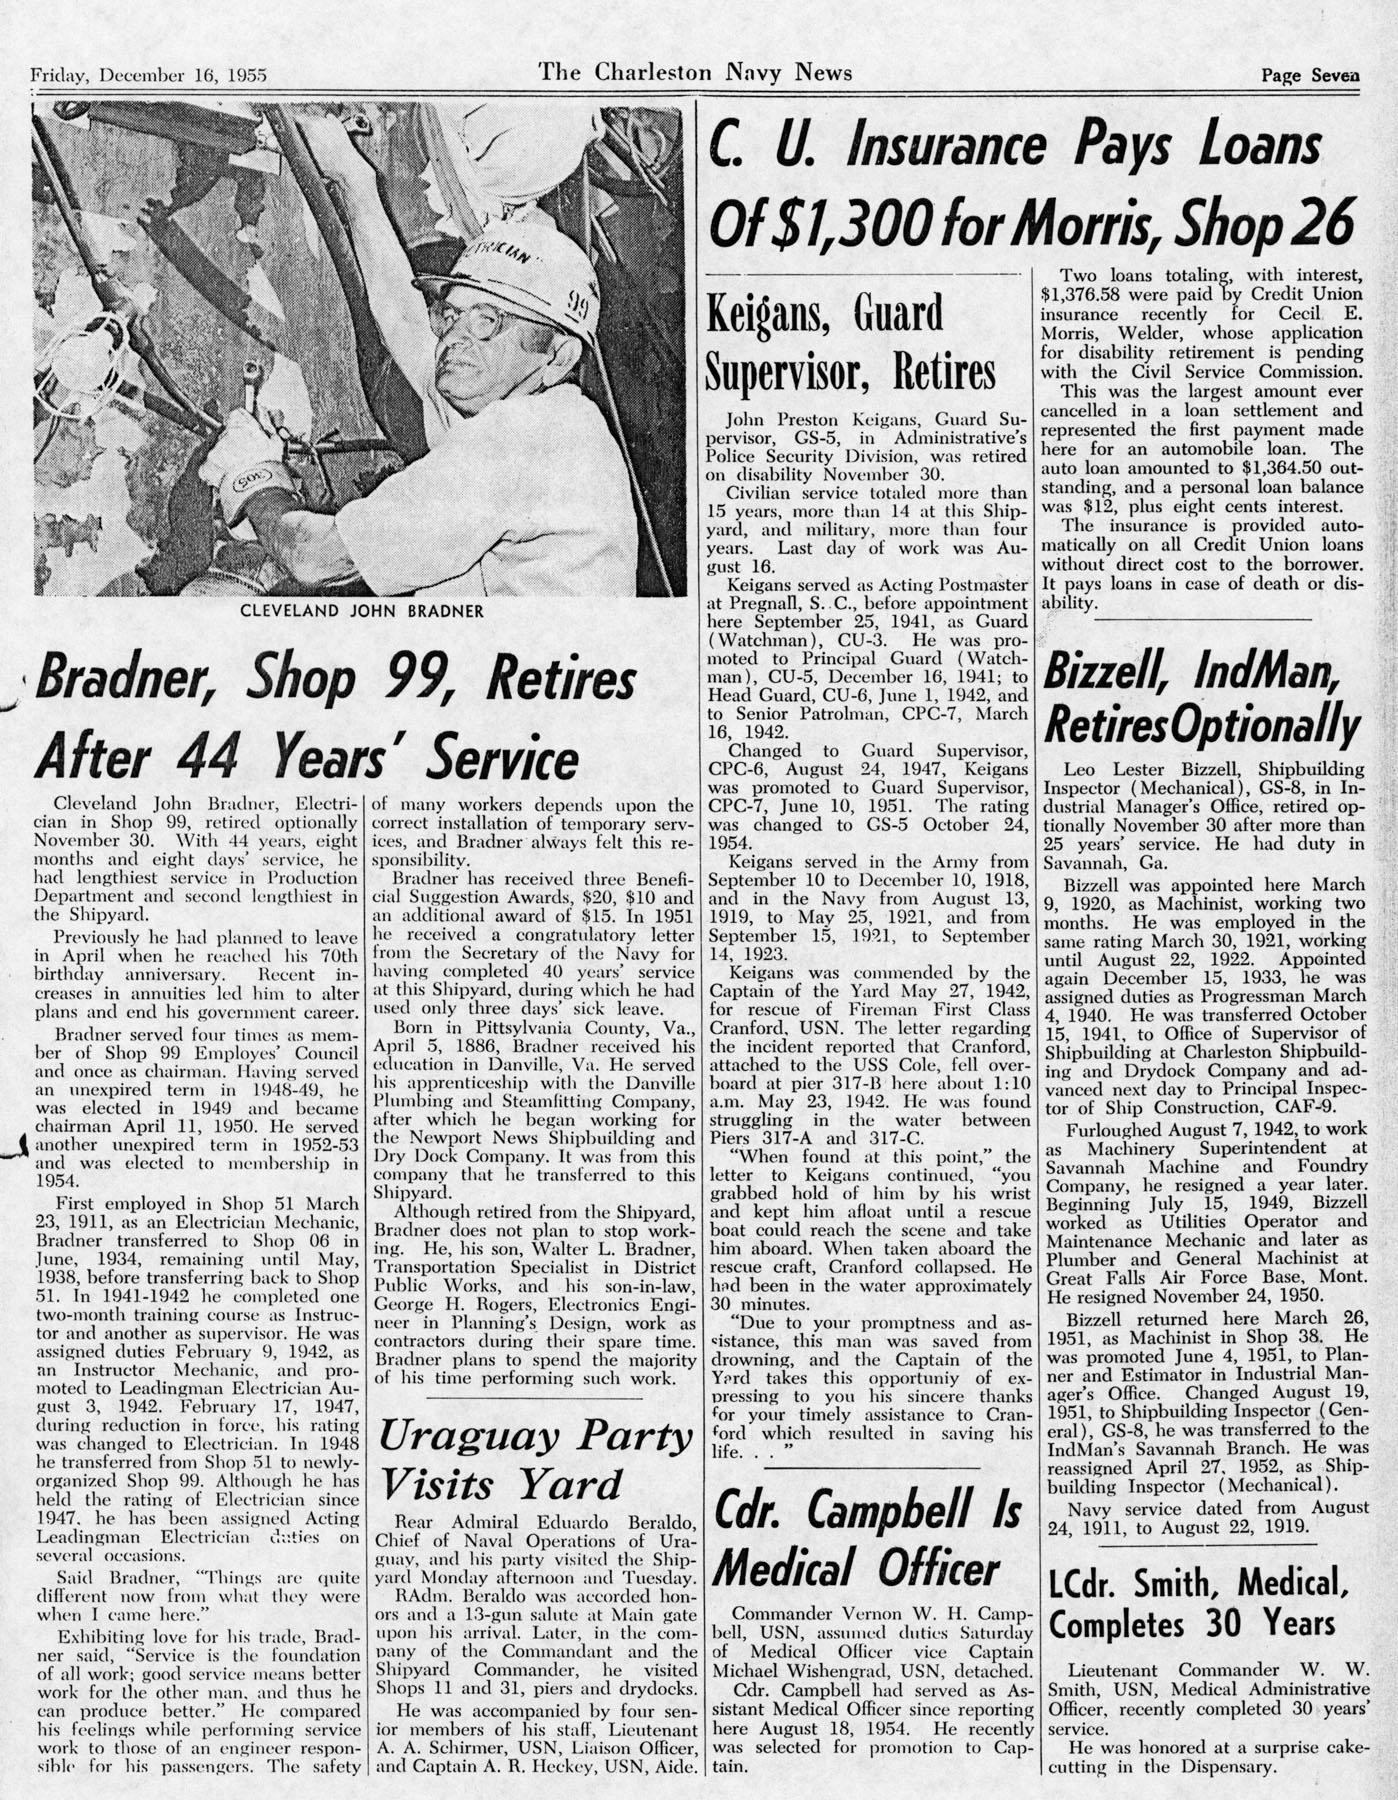 The Charleston Navy News, Volume 14, Edition 11, page vii